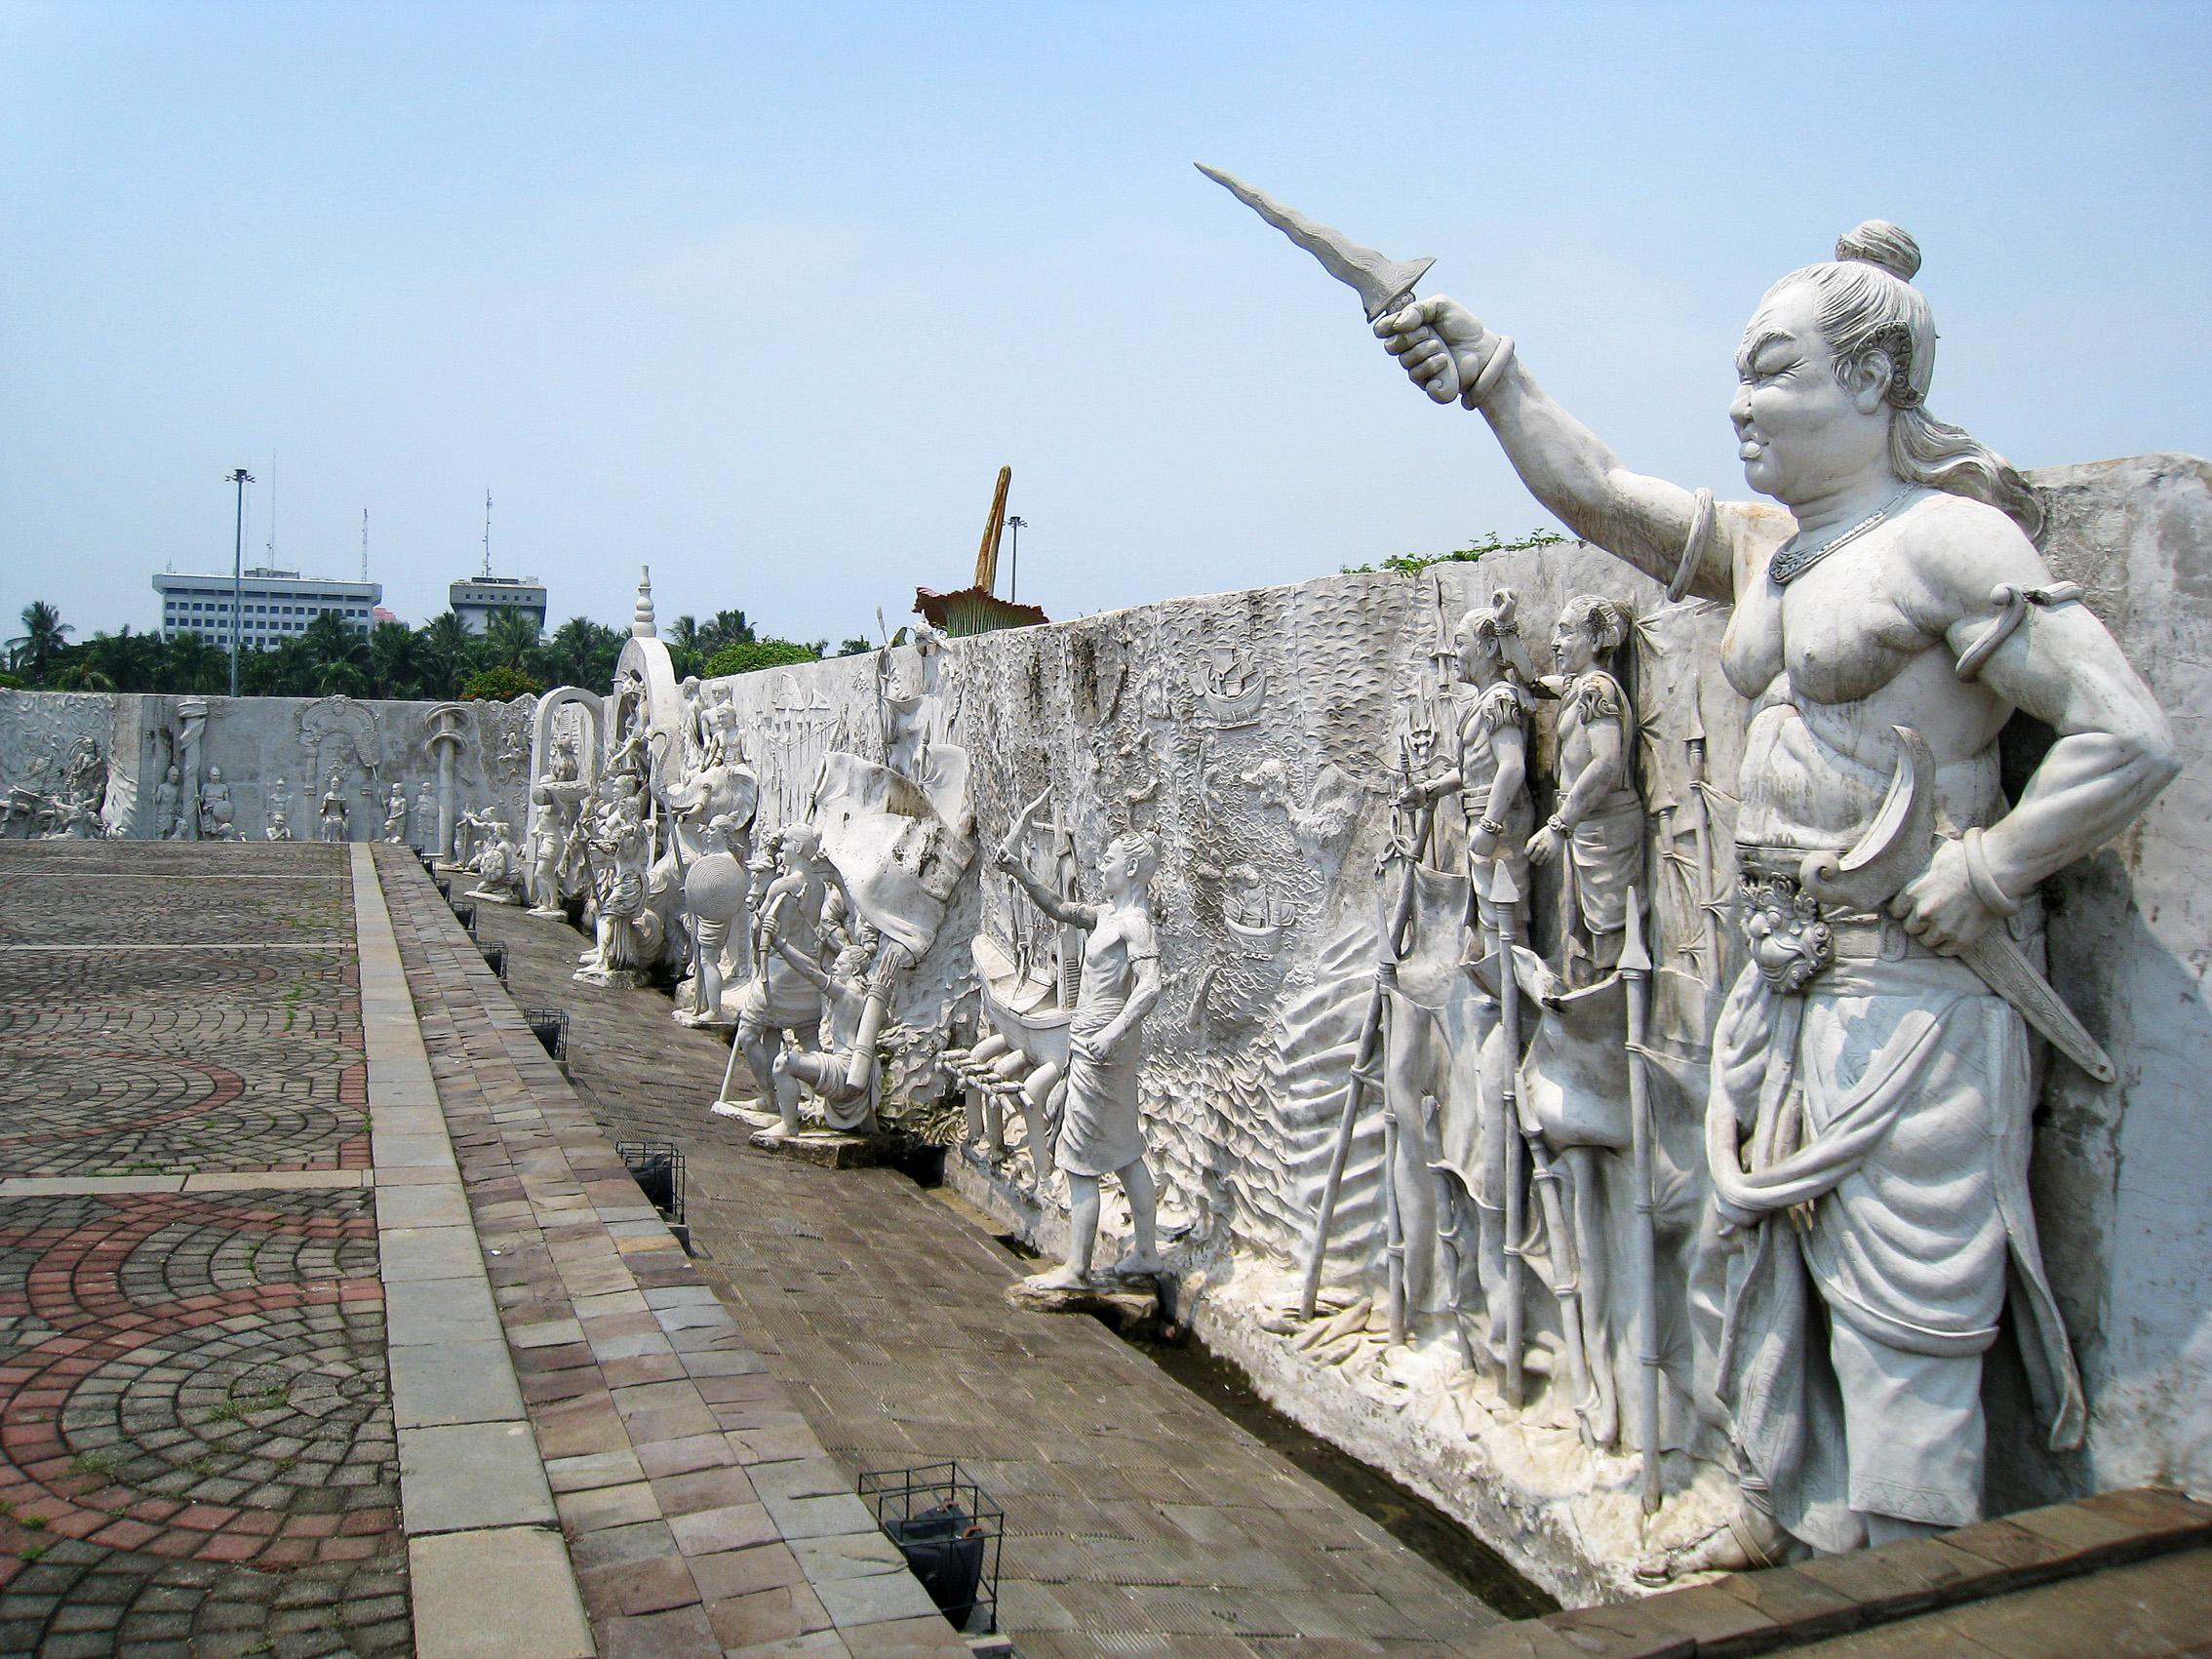 Monumen Nasional Wikipedia Bahasa Indonesia Ensiklopedia Bebas